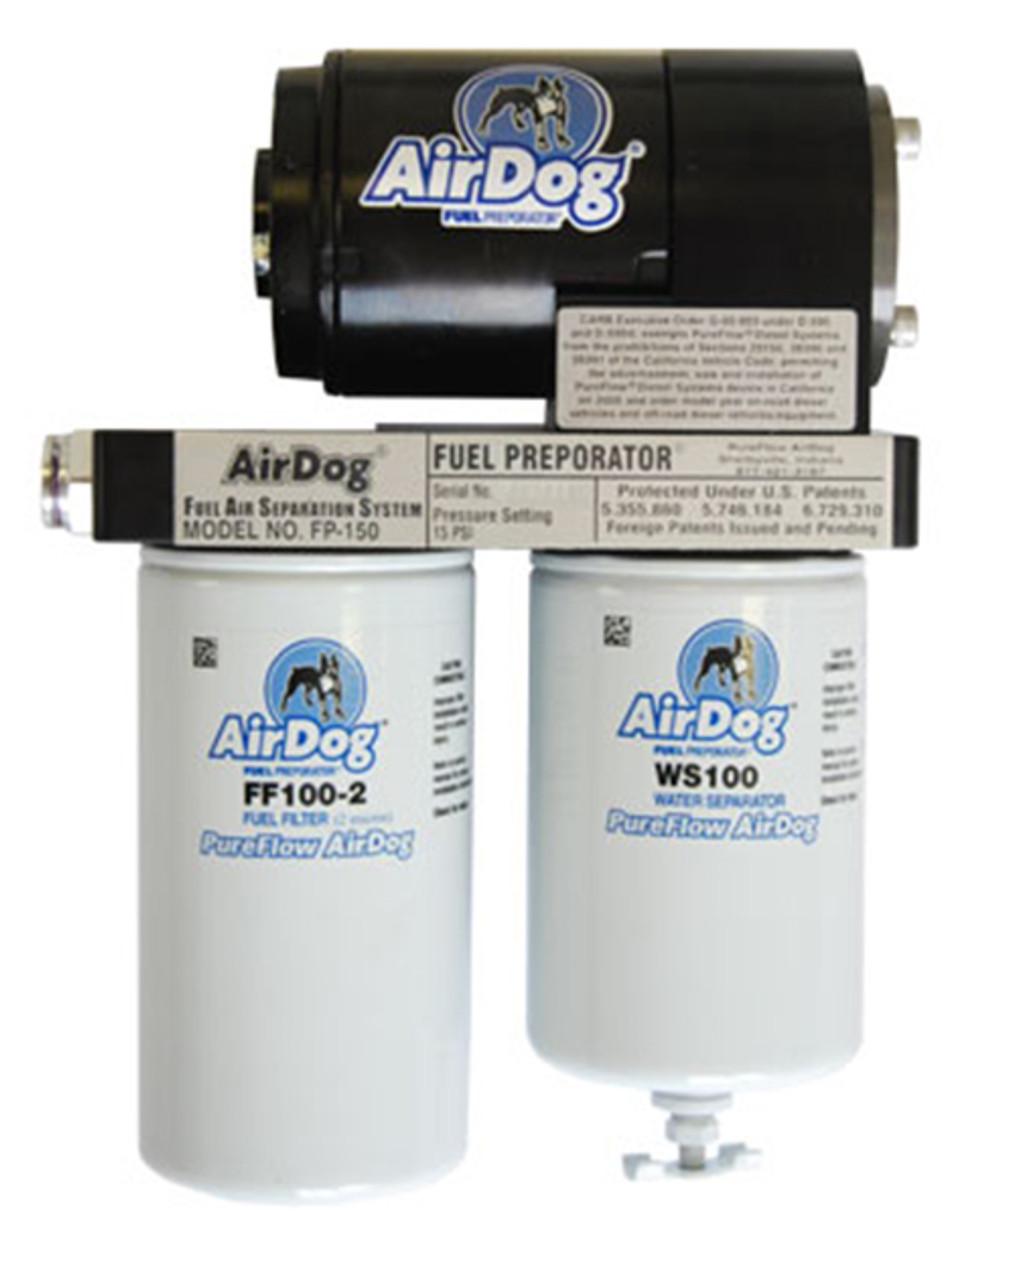 Pureflow/Airdog 2001-2009 Chevy Duramax AirDog 150 Preset - Quick Disconnect